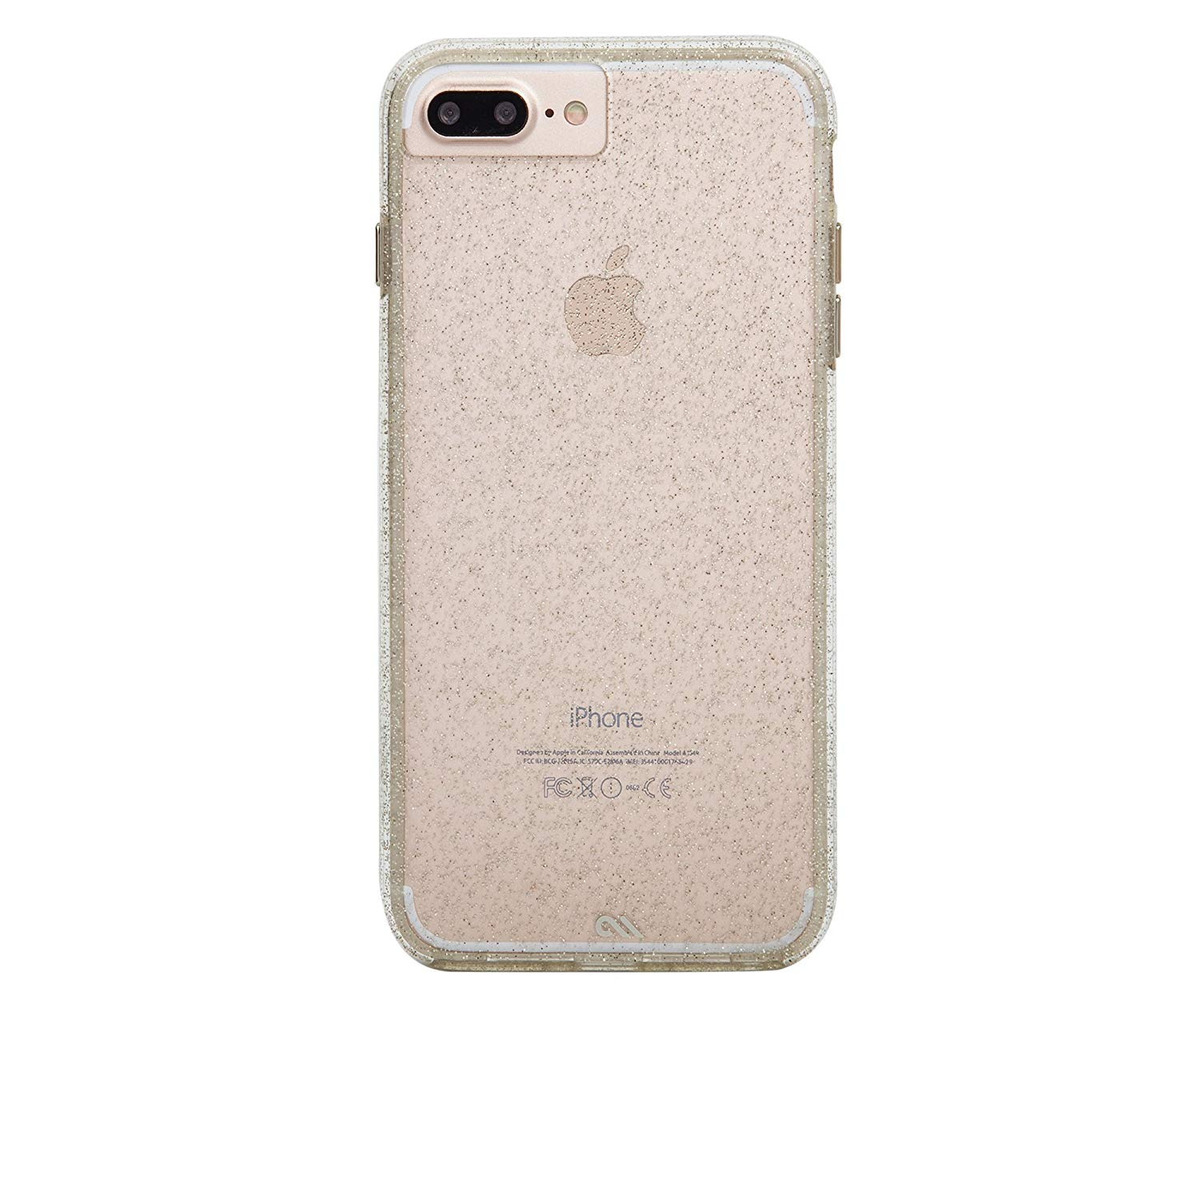 a723ebb6c6a iphone 7-plus funda - naked tough - sparkle effect - - iphon ...